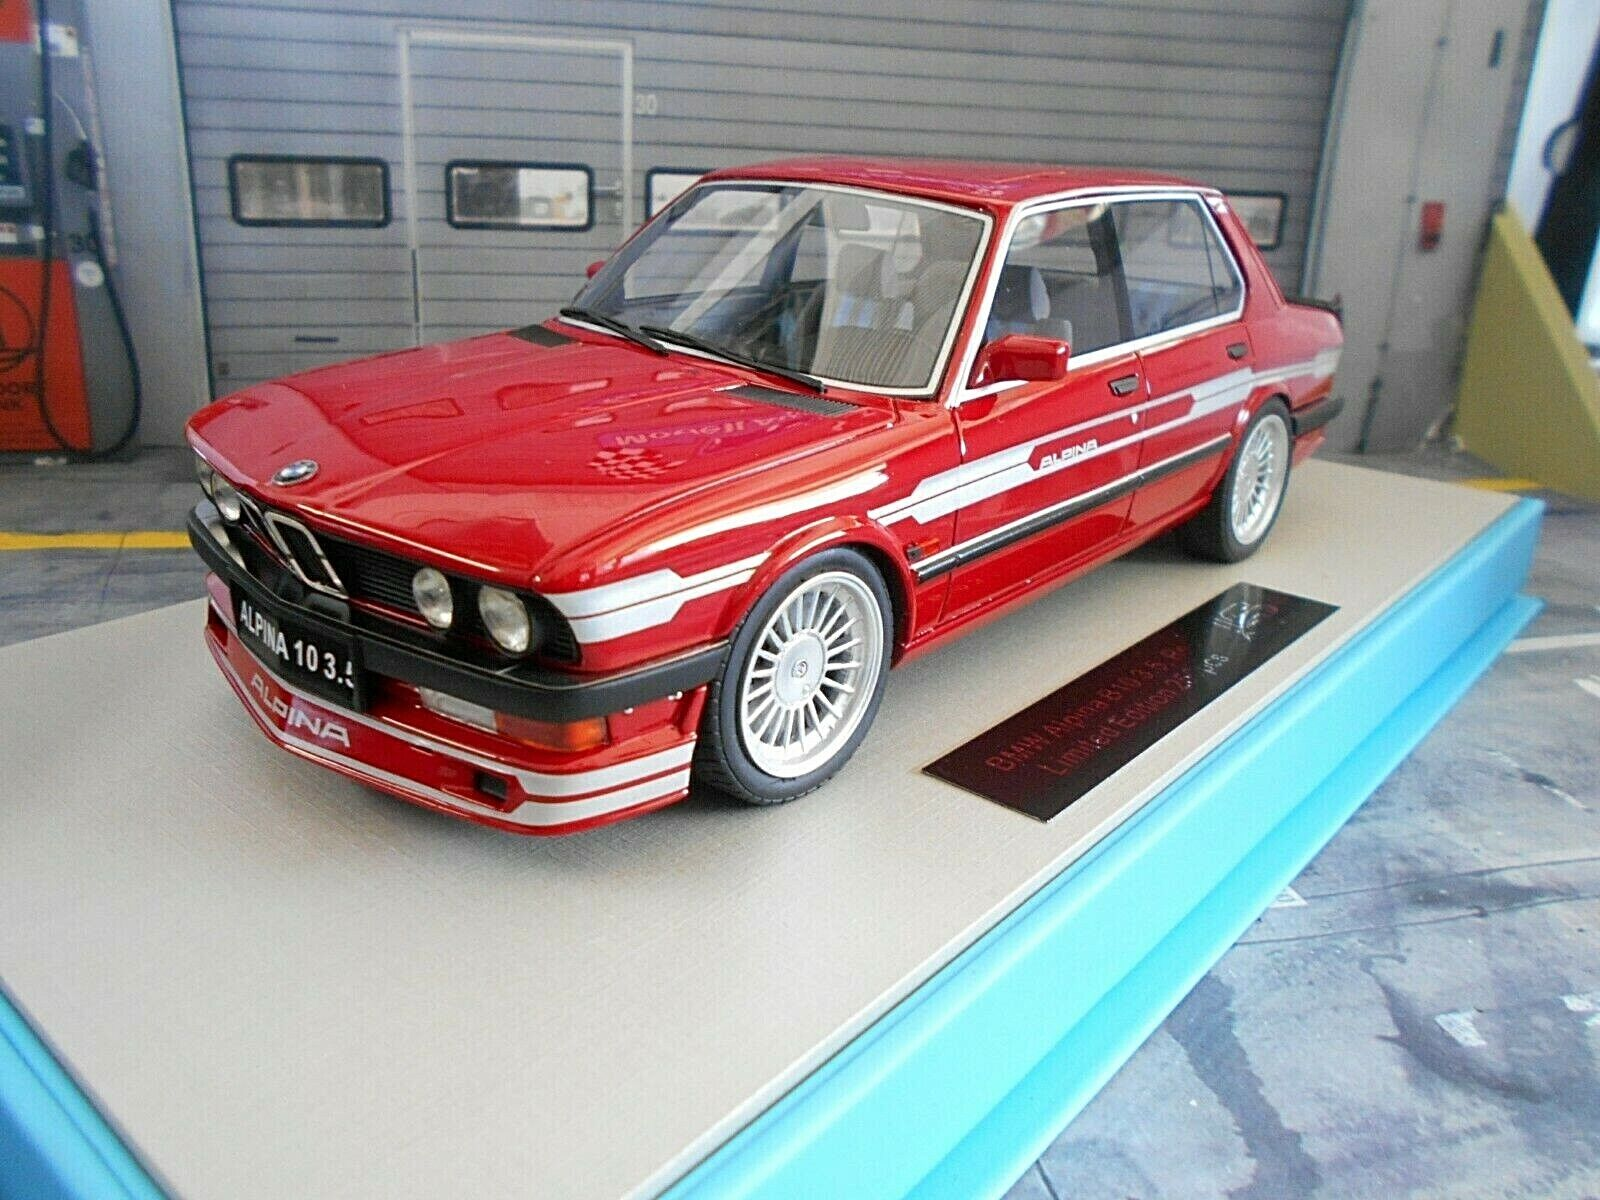 BMW 5er Series B10 3.5 Biturbo Alpina 1989 Red Red E24 E28 LS Collectibles 1 18